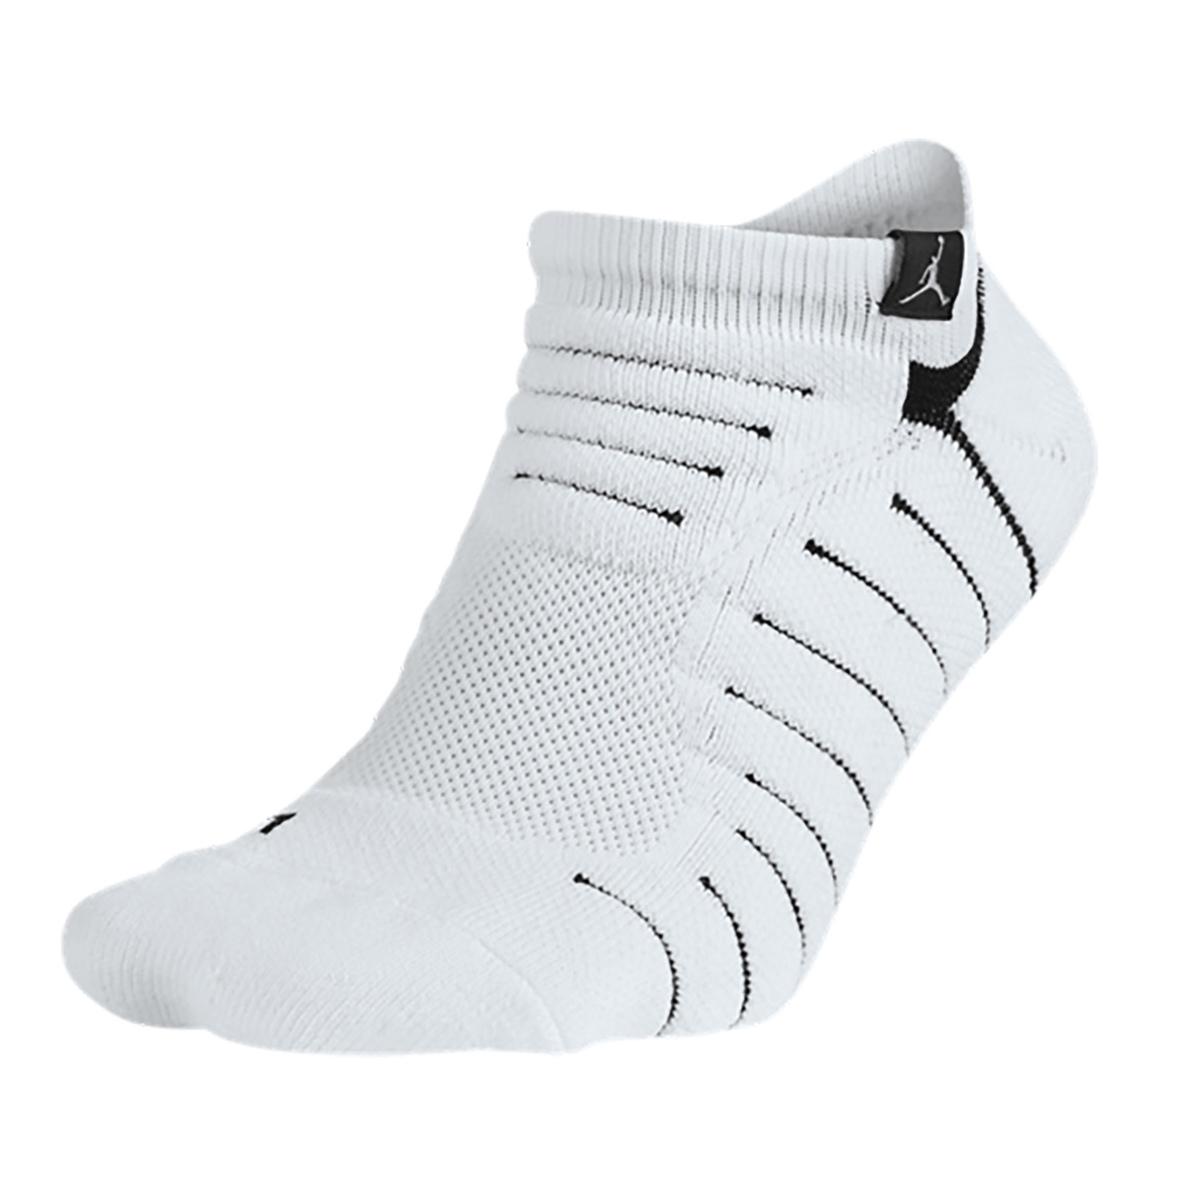 Calza ultimate flight ankle